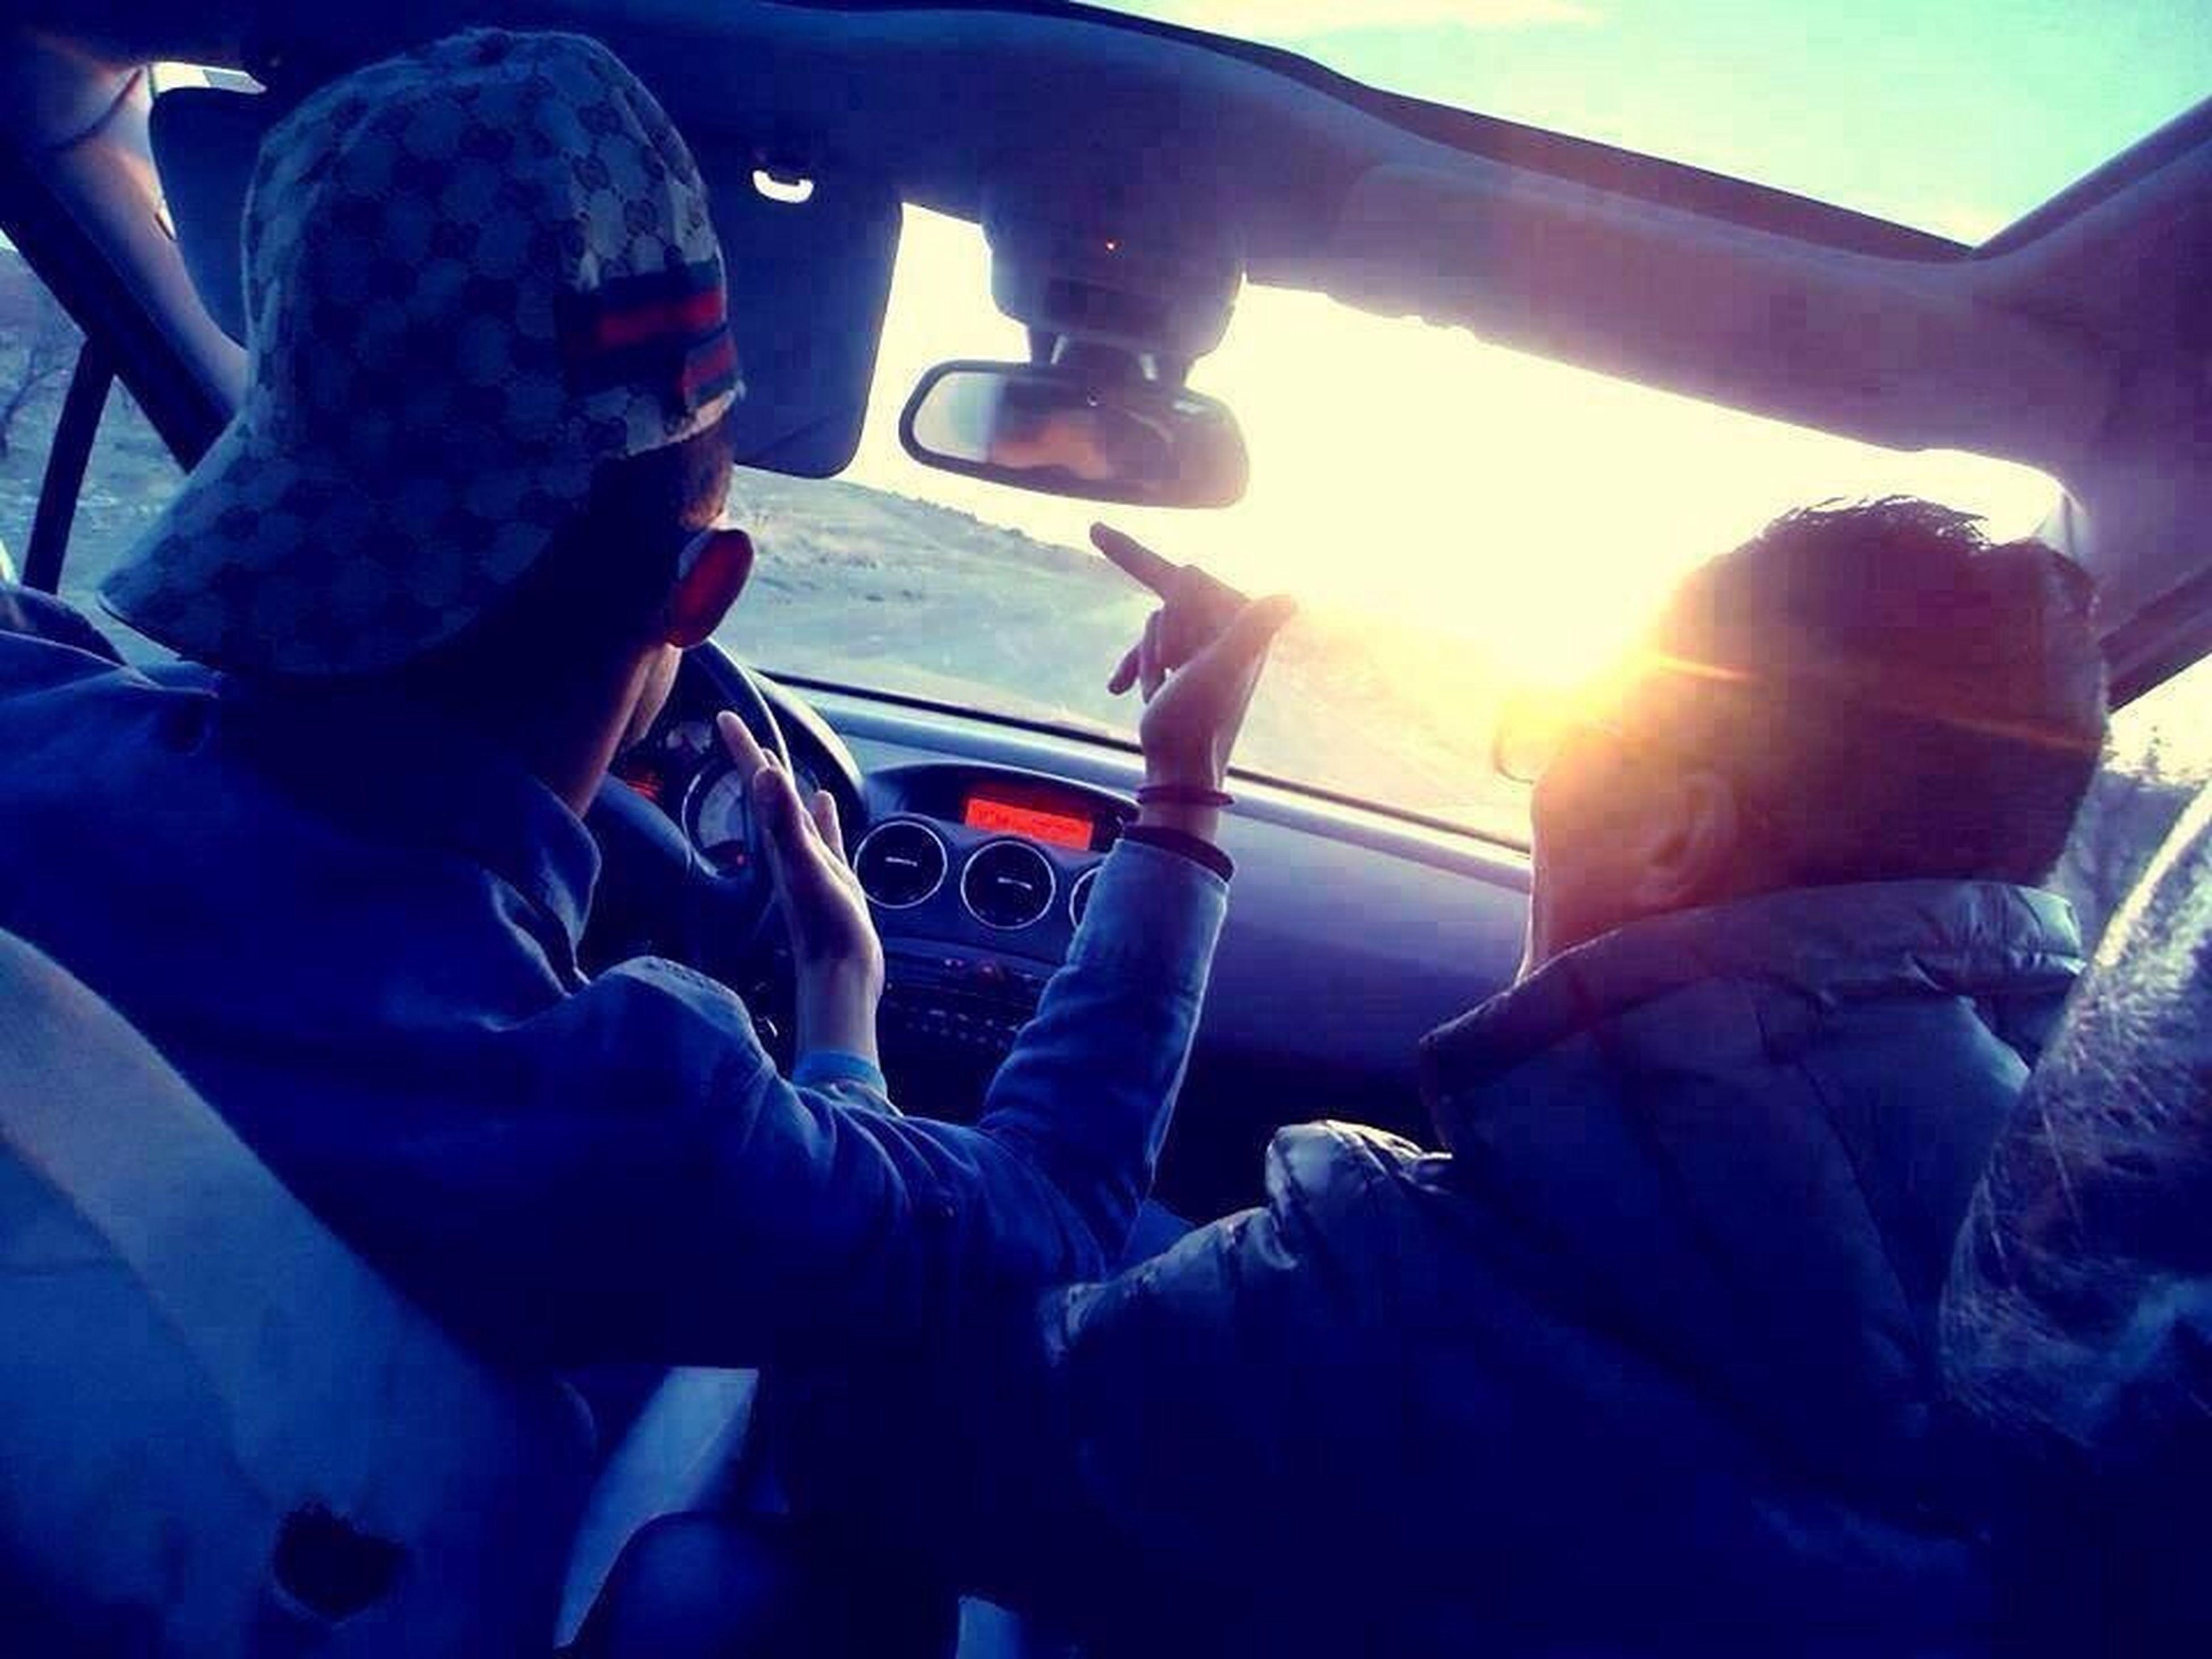 lifestyles, leisure activity, men, transportation, togetherness, sitting, mode of transport, vehicle interior, travel, land vehicle, bonding, sunlight, person, sun, casual clothing, love, journey